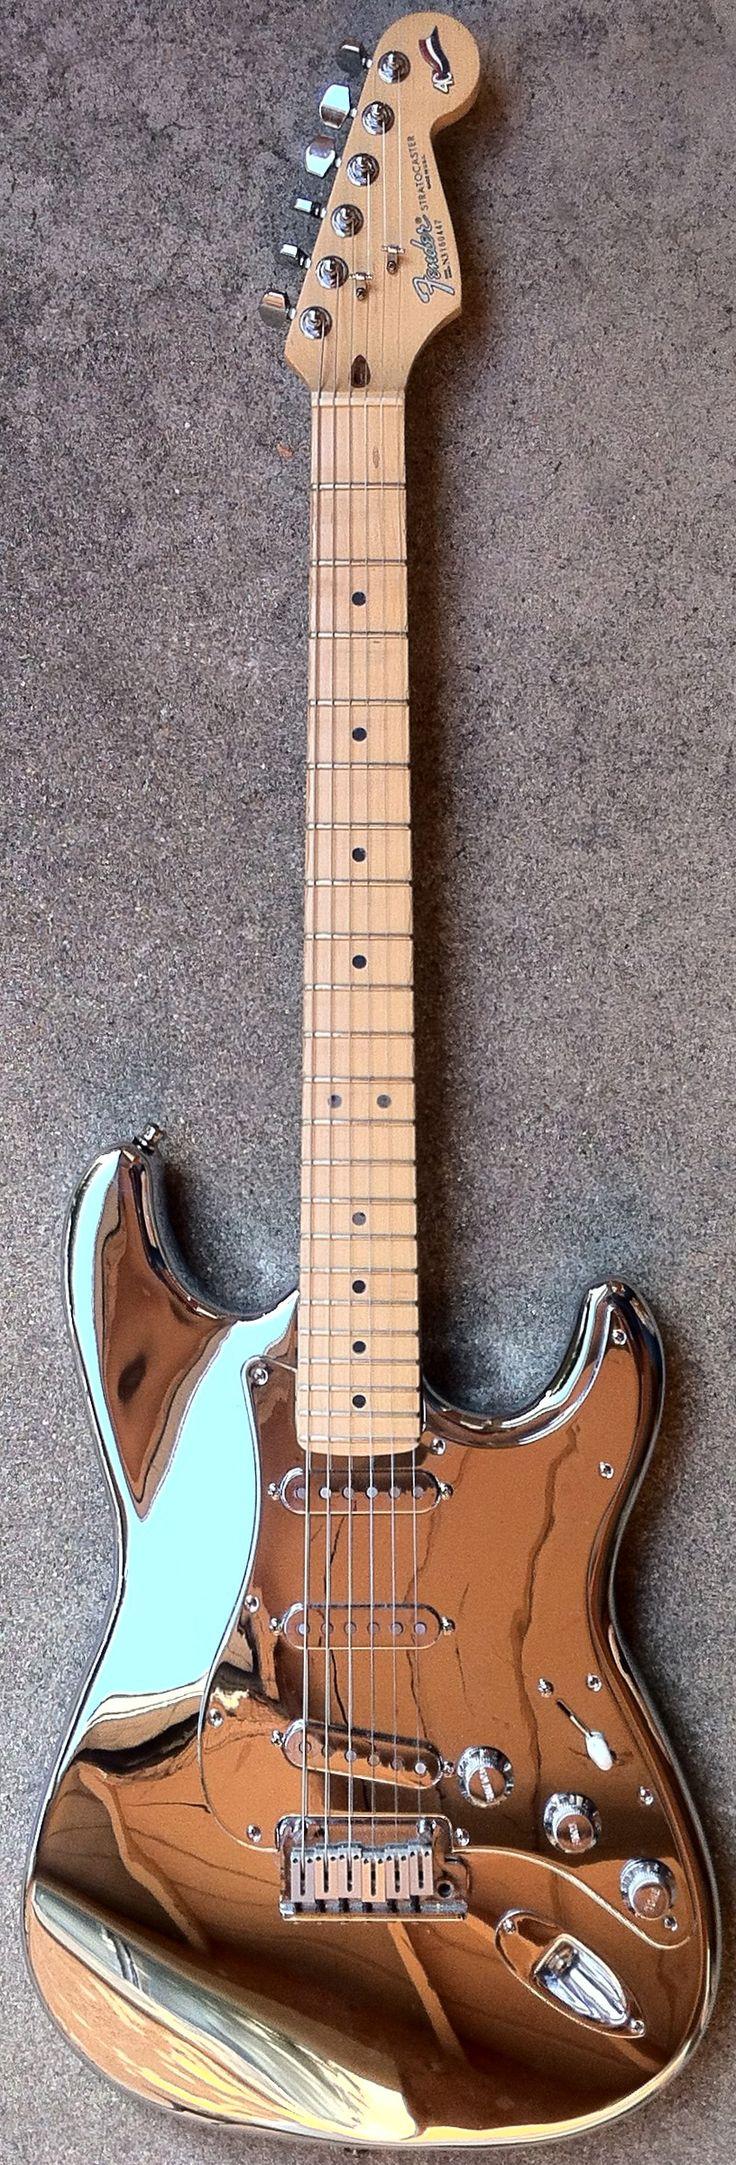 Beautiful! Rayna James guitar from Nashville. How fun!